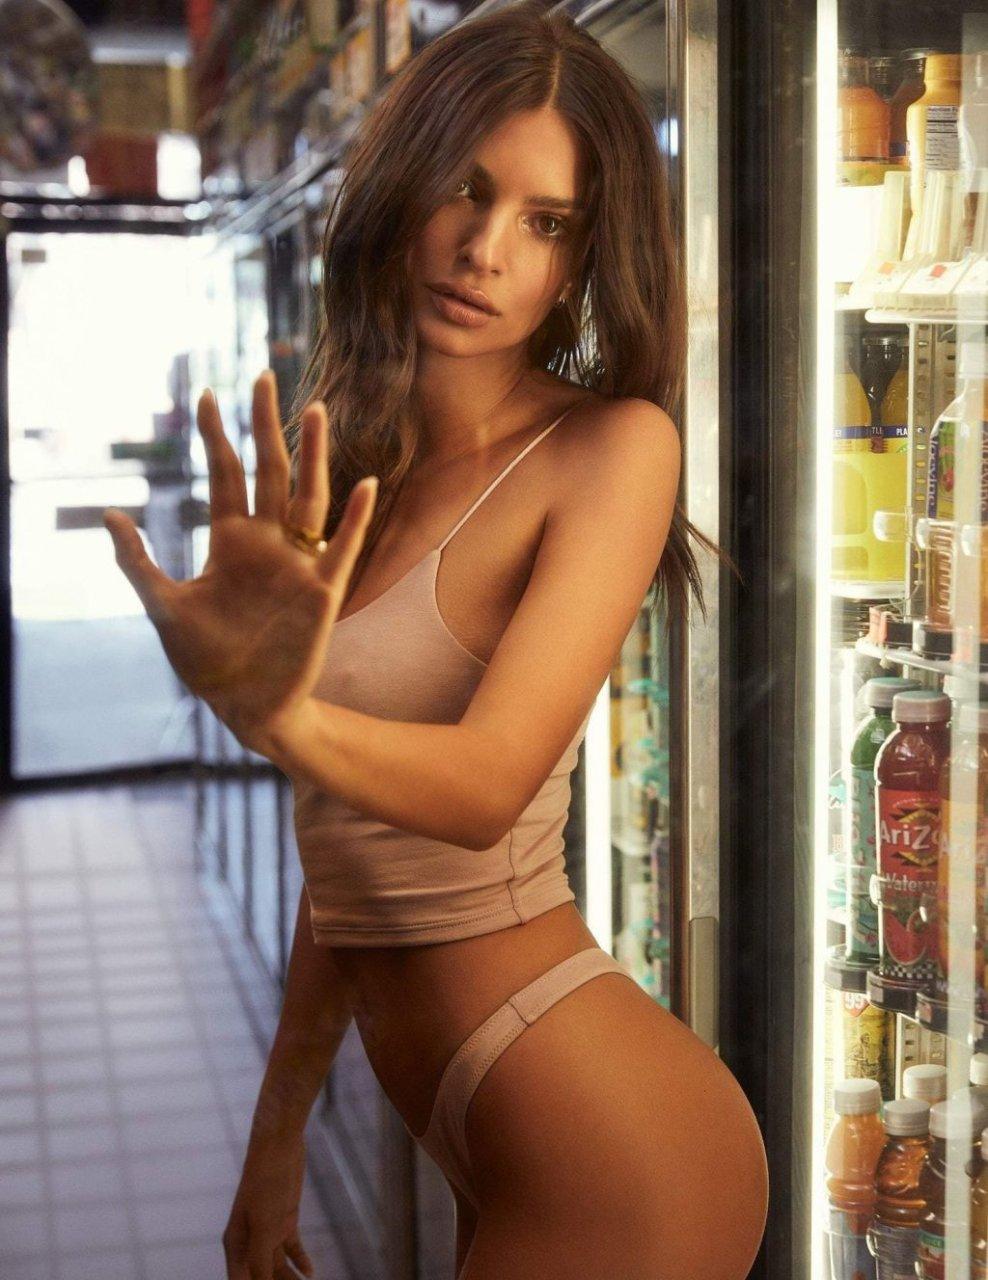 nude photos Jennifer aniston leaked